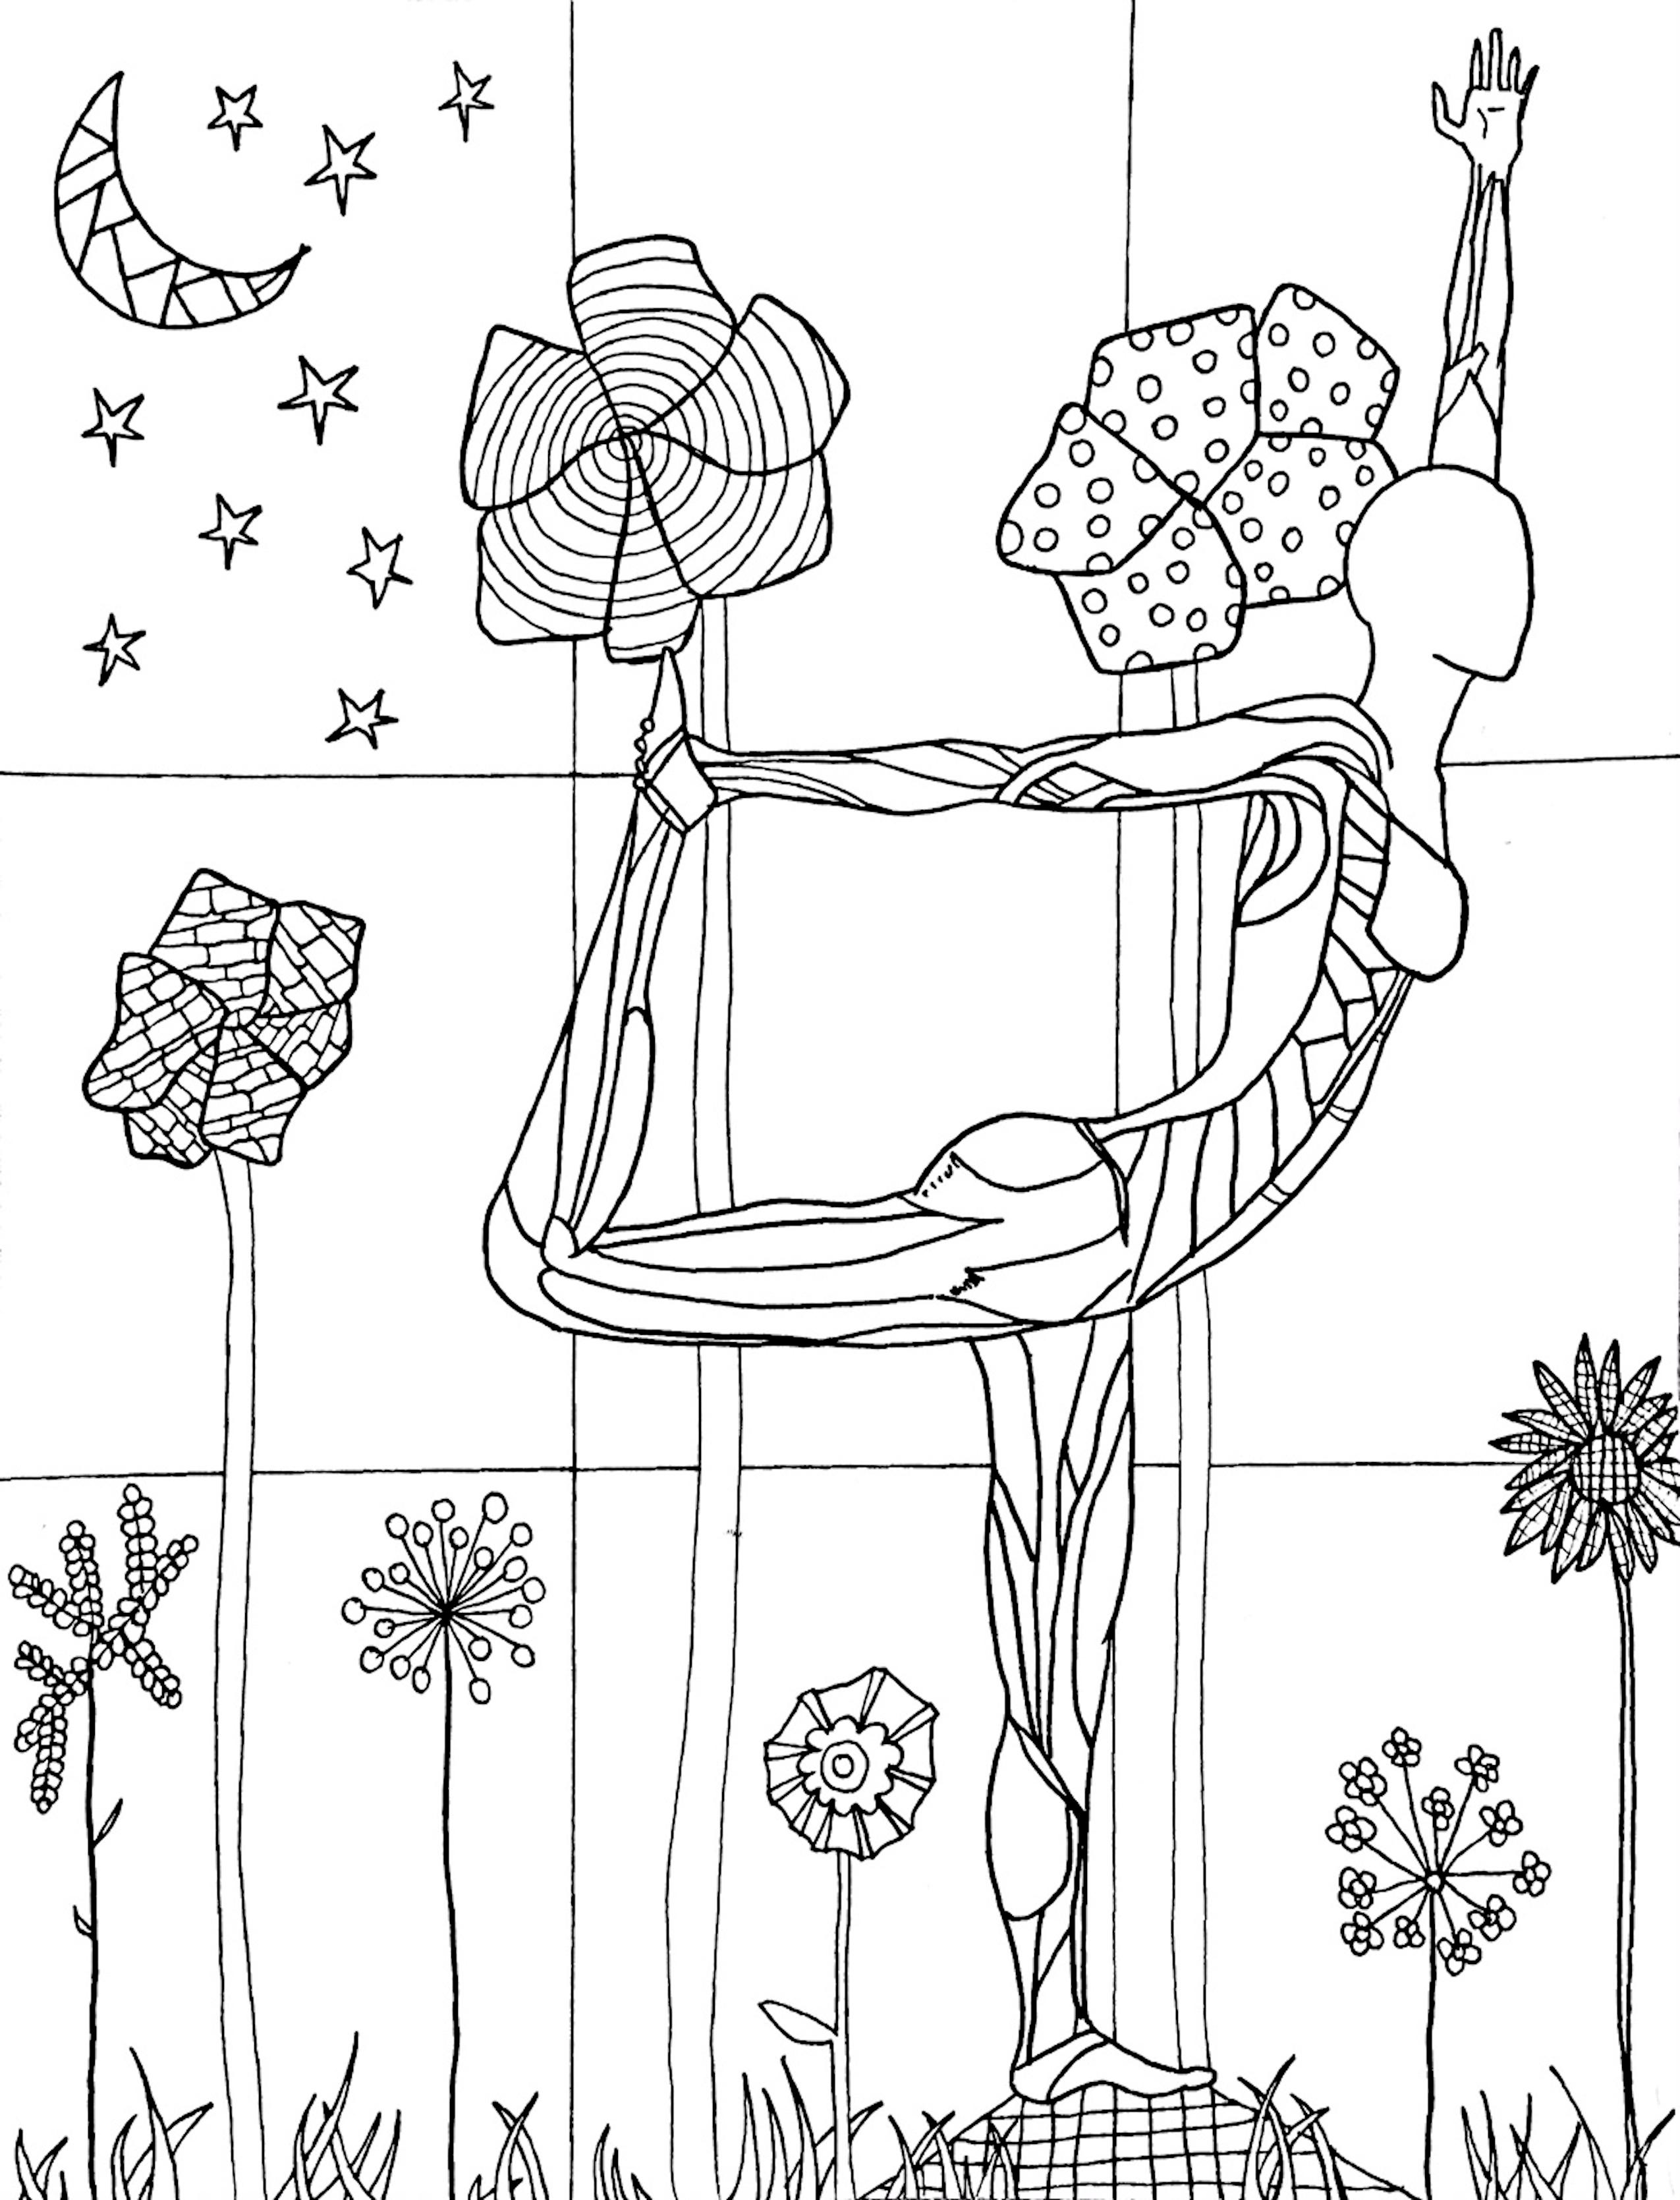 Exploration coloring #3, Download drawings